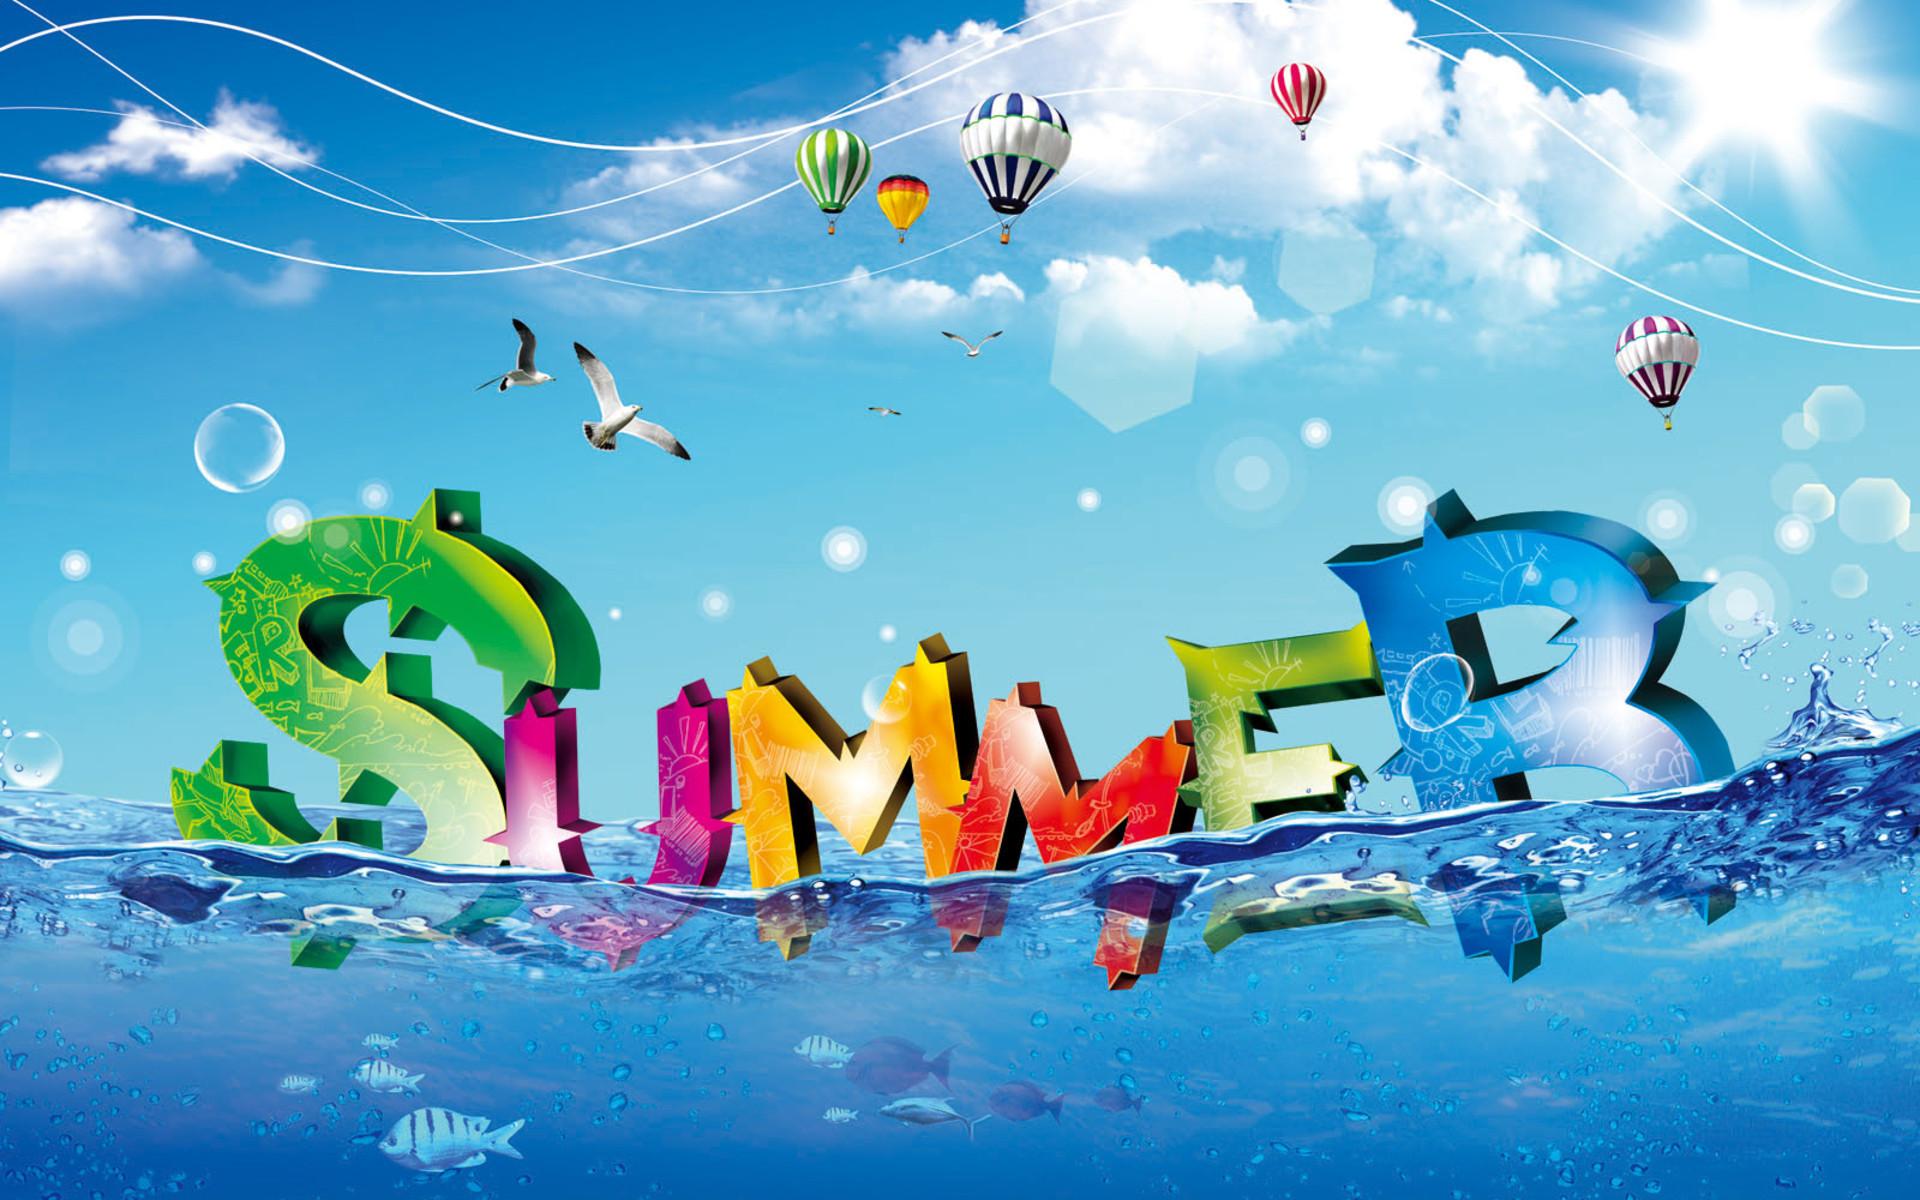 wallpaper-screensavers-summer-wallpapers.jpg